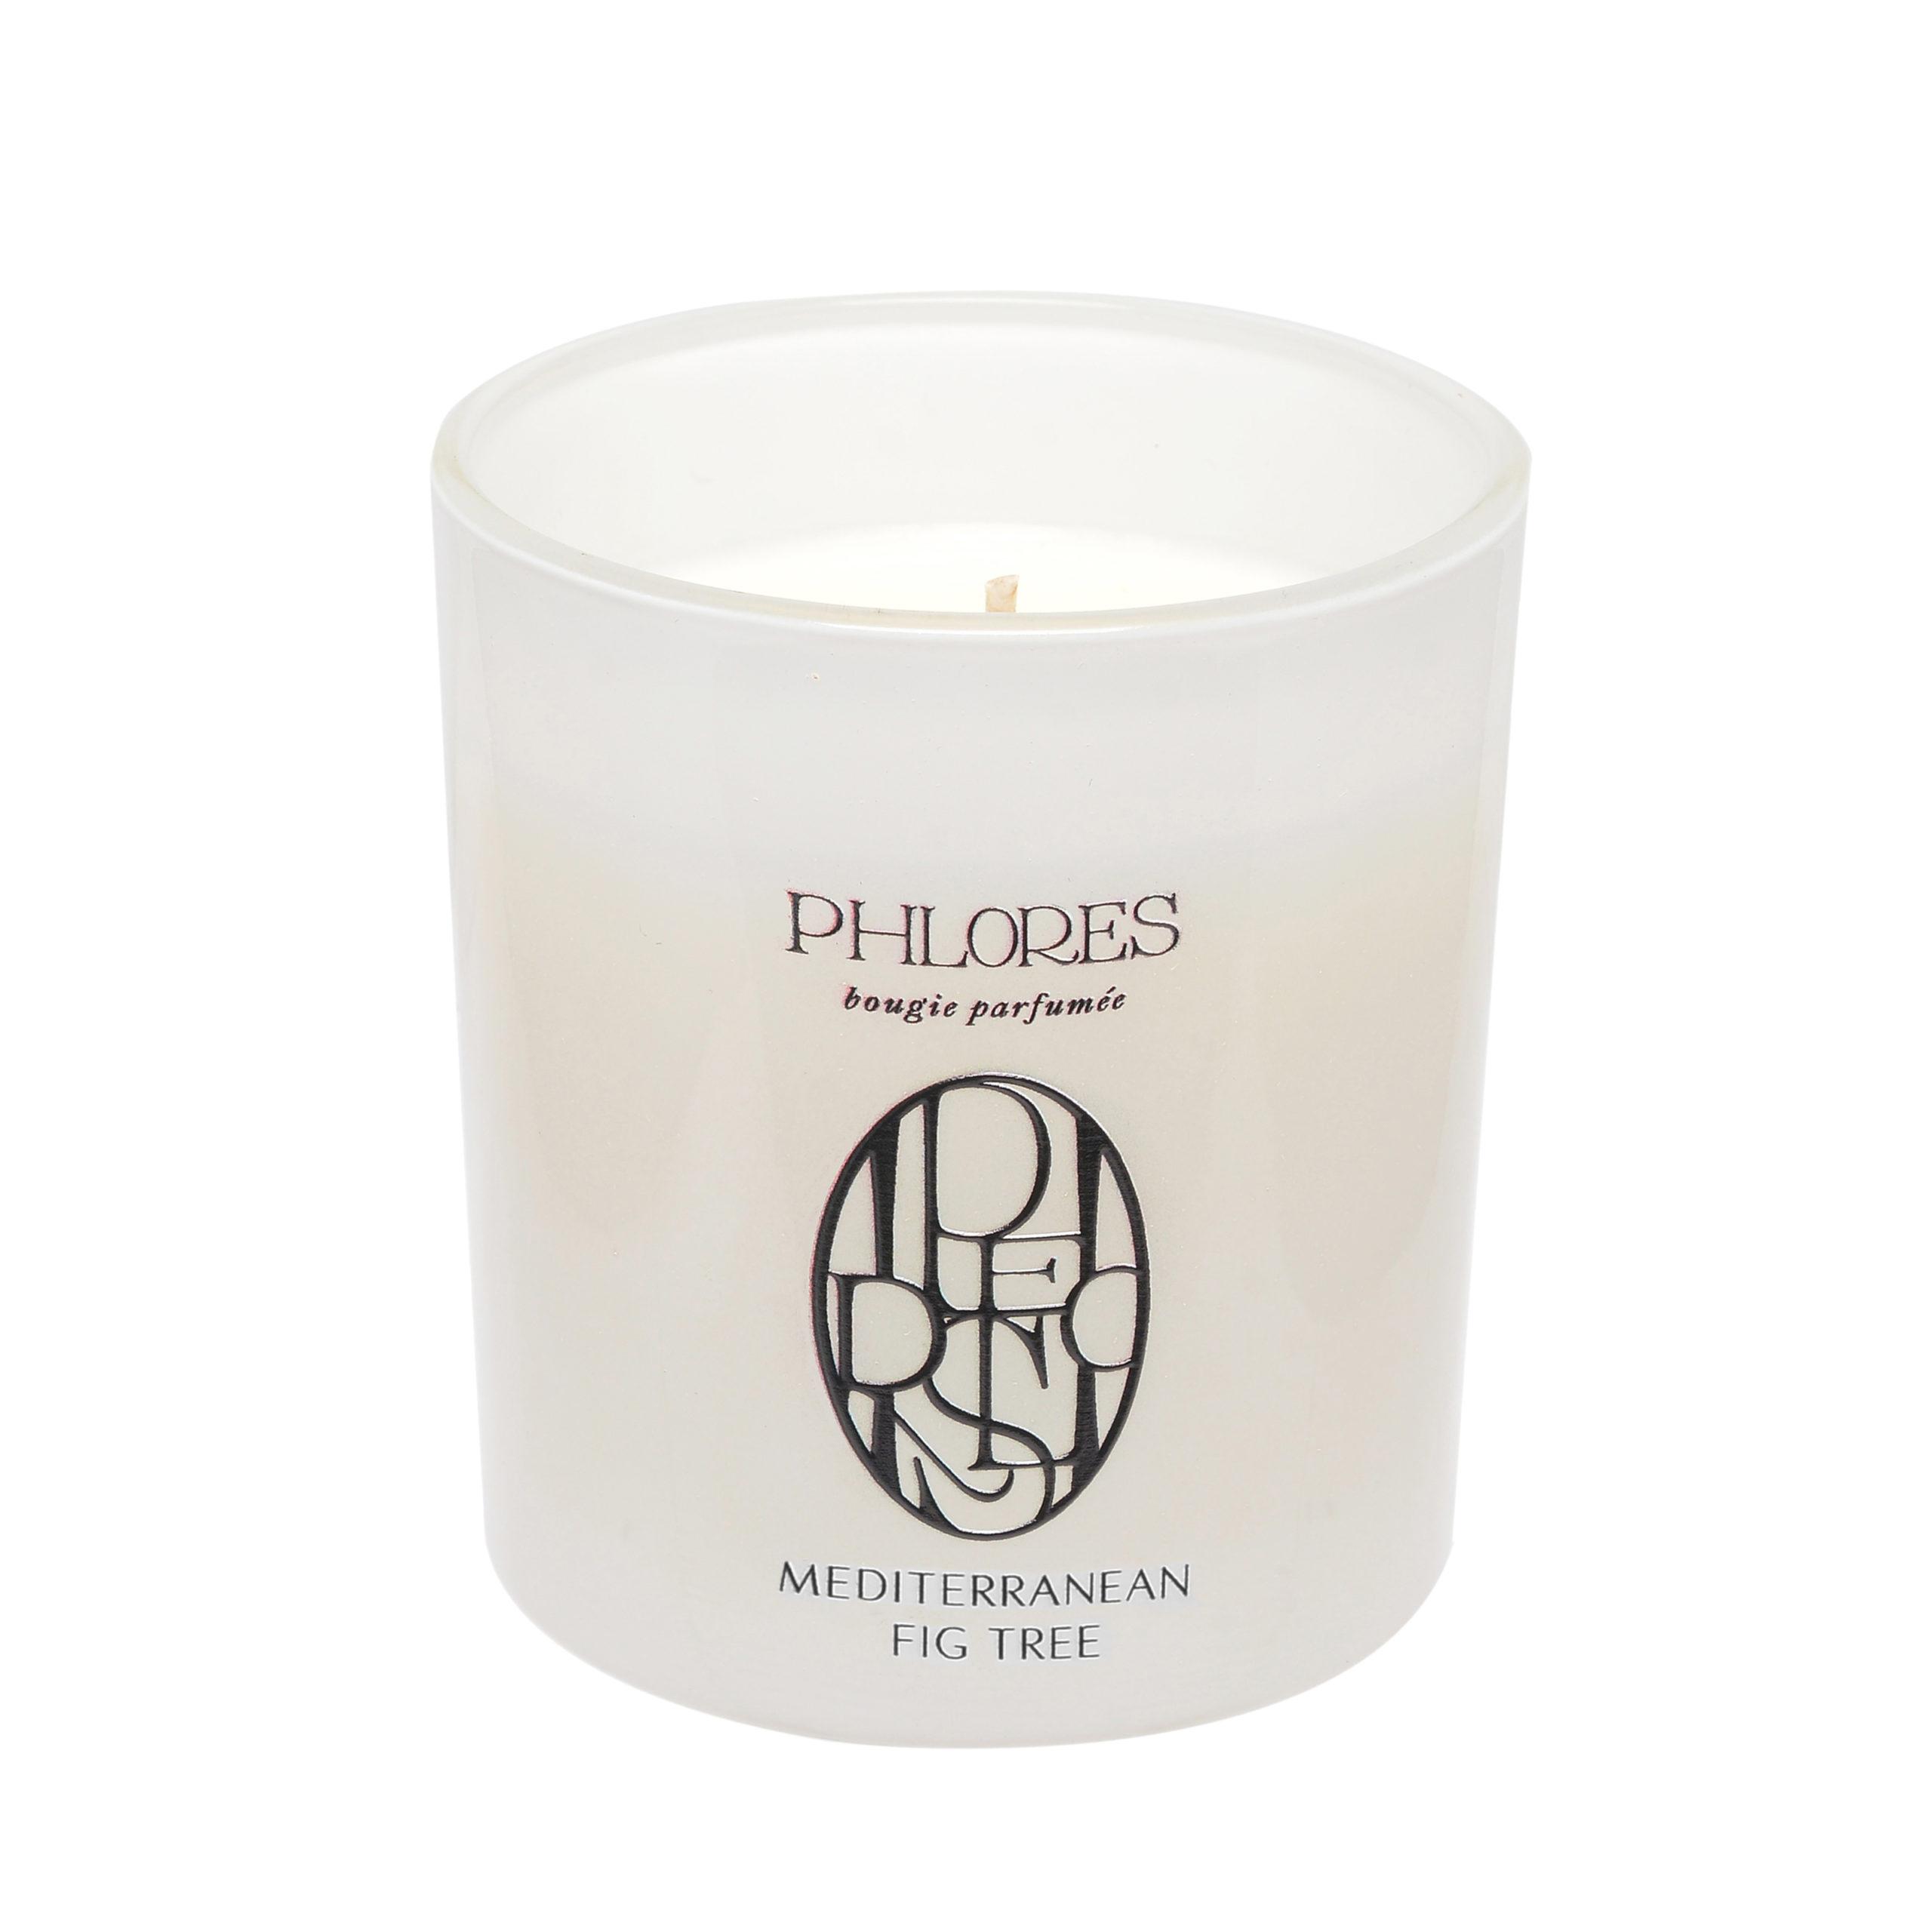 PHLORES Mediterranean Fig Tree Soy candle | SoBio Beauty Boutique